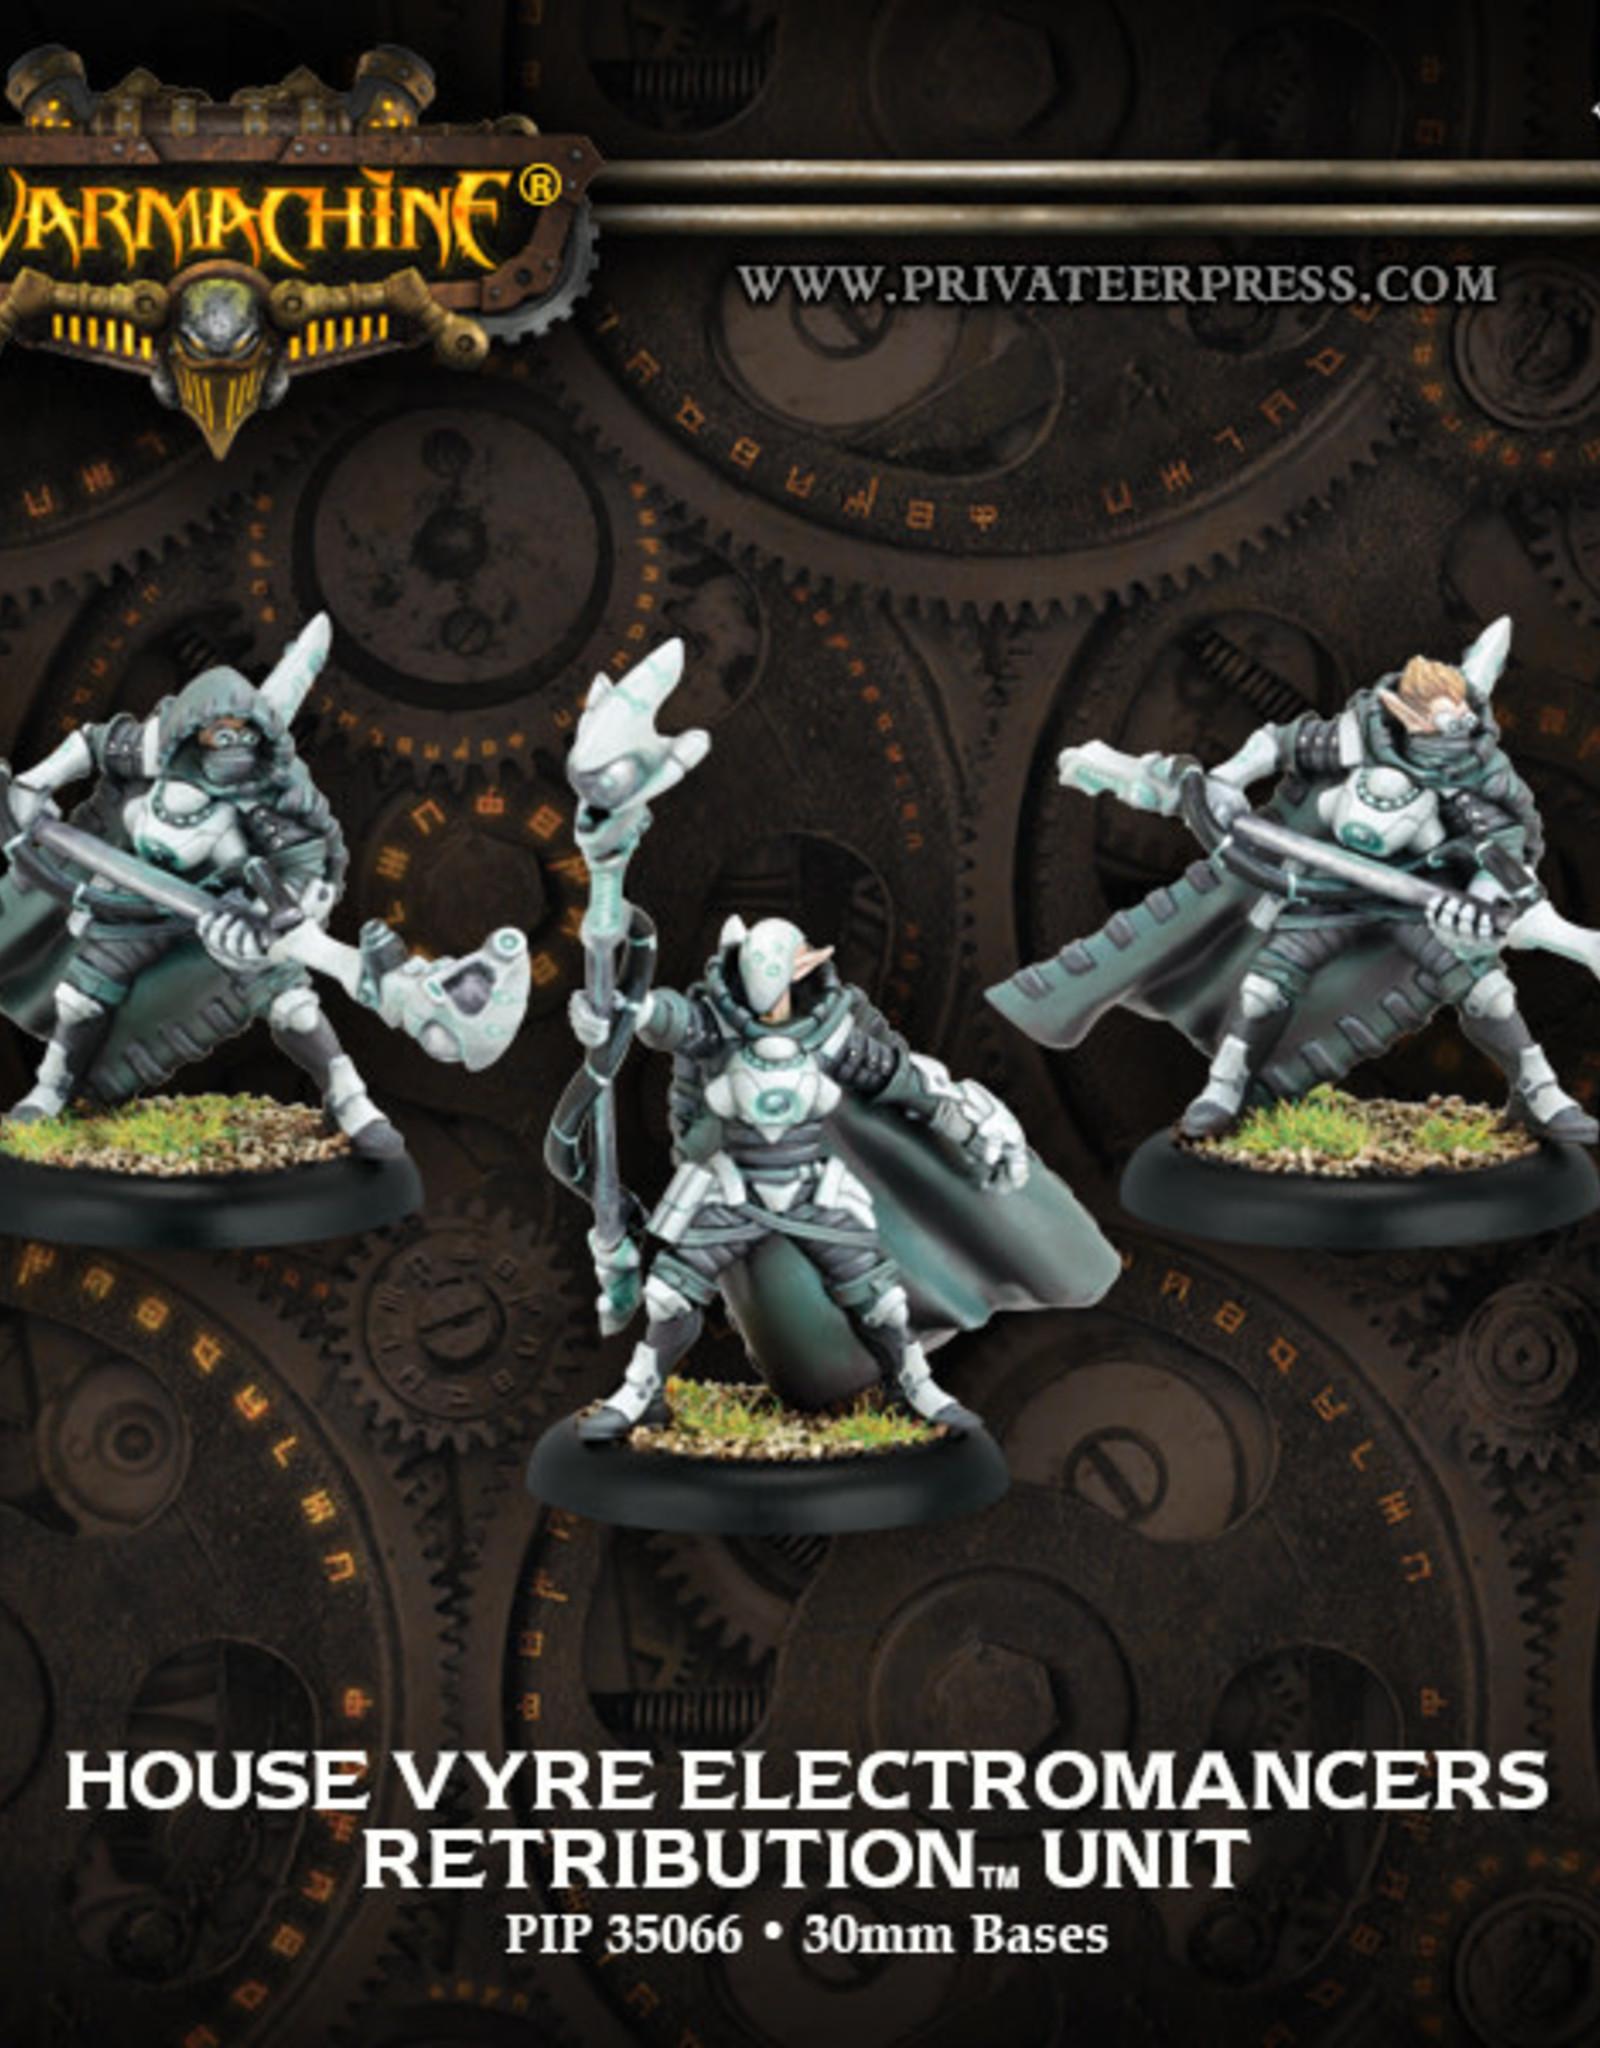 Warmachine Scyrah - Vyre Electromancers